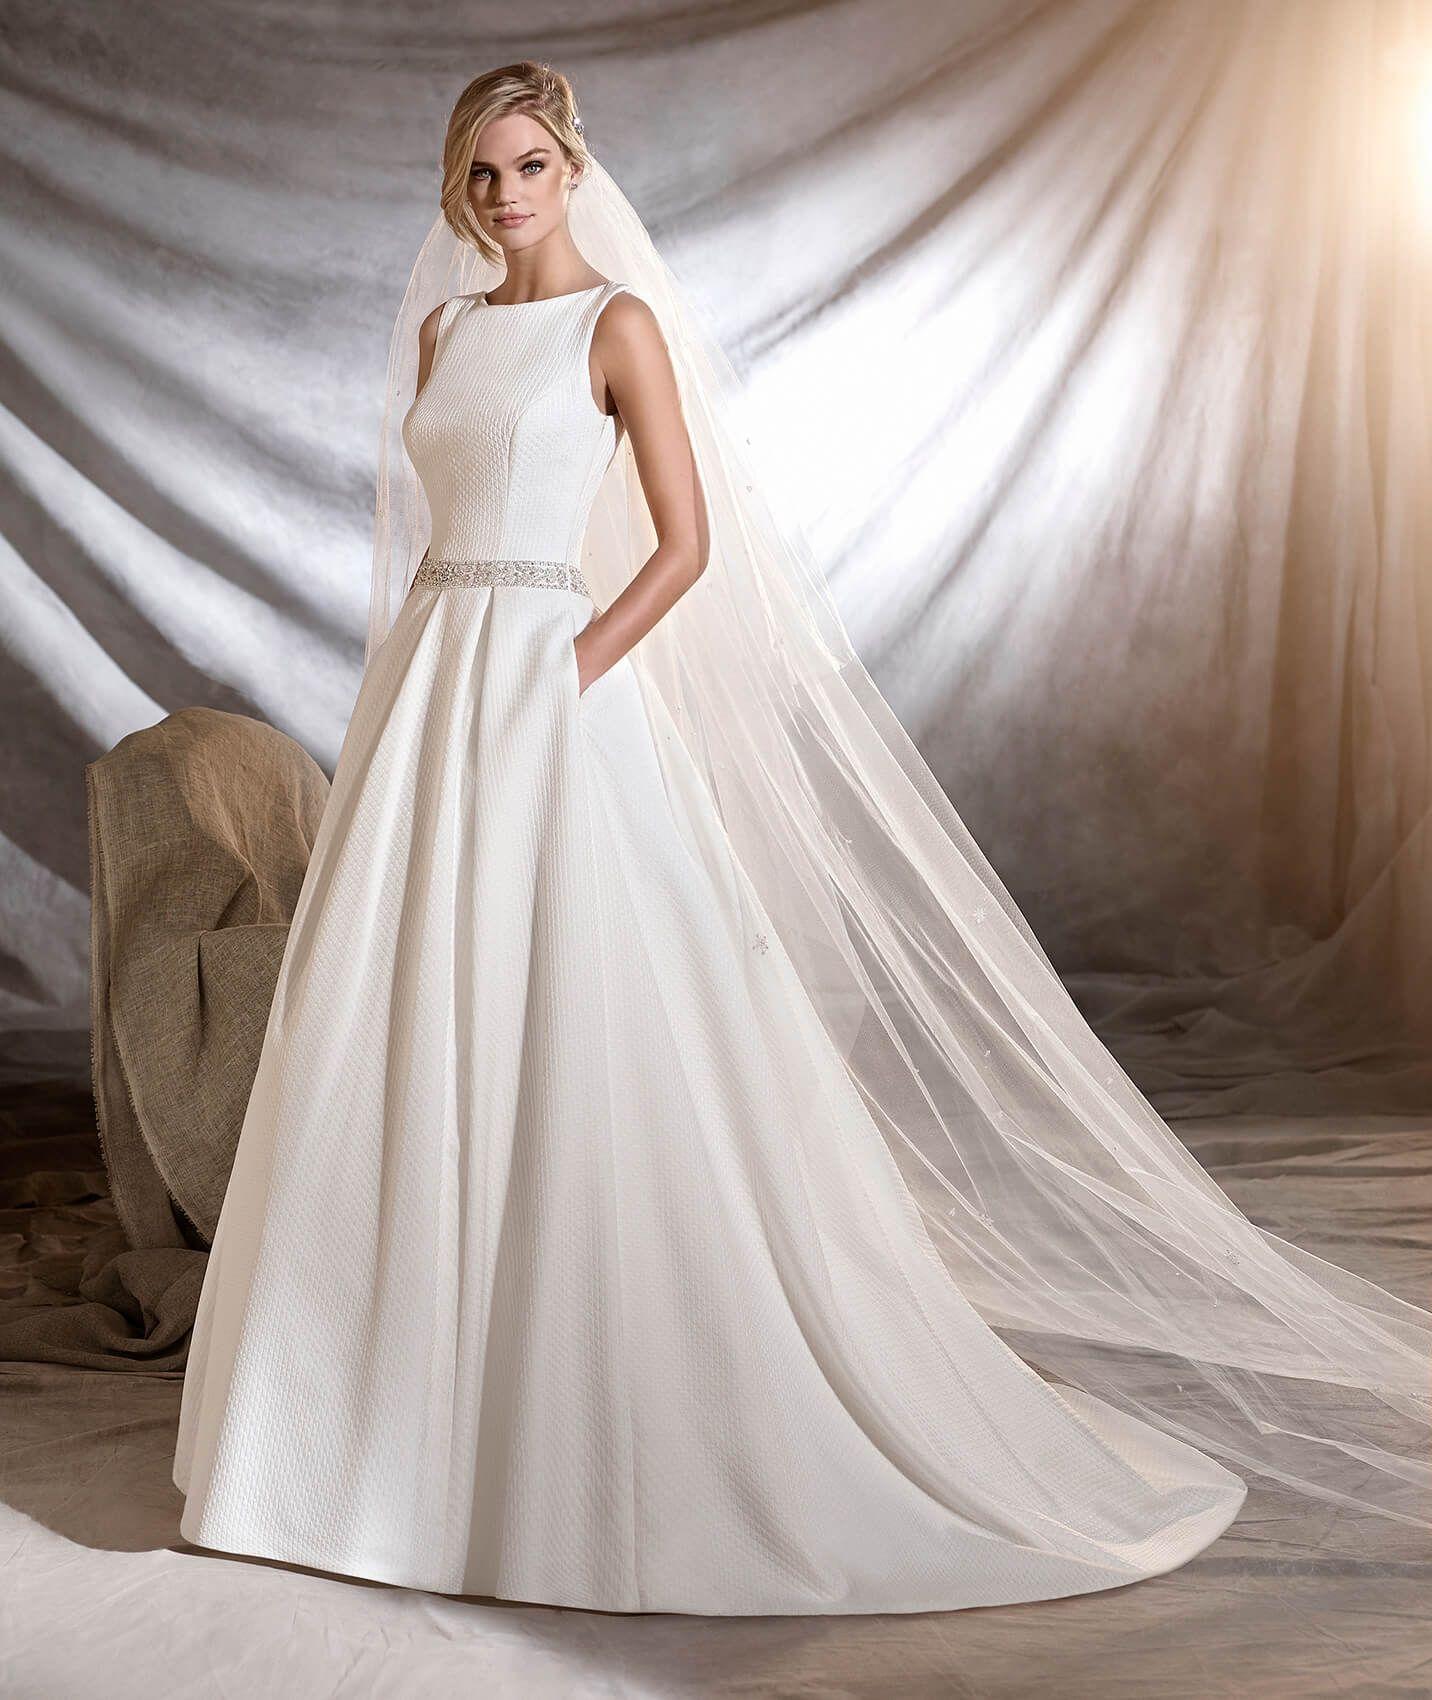 Olmedo classic style princess style wedding dress say yes to olmedo classic style princess style wedding dress ombrellifo Choice Image